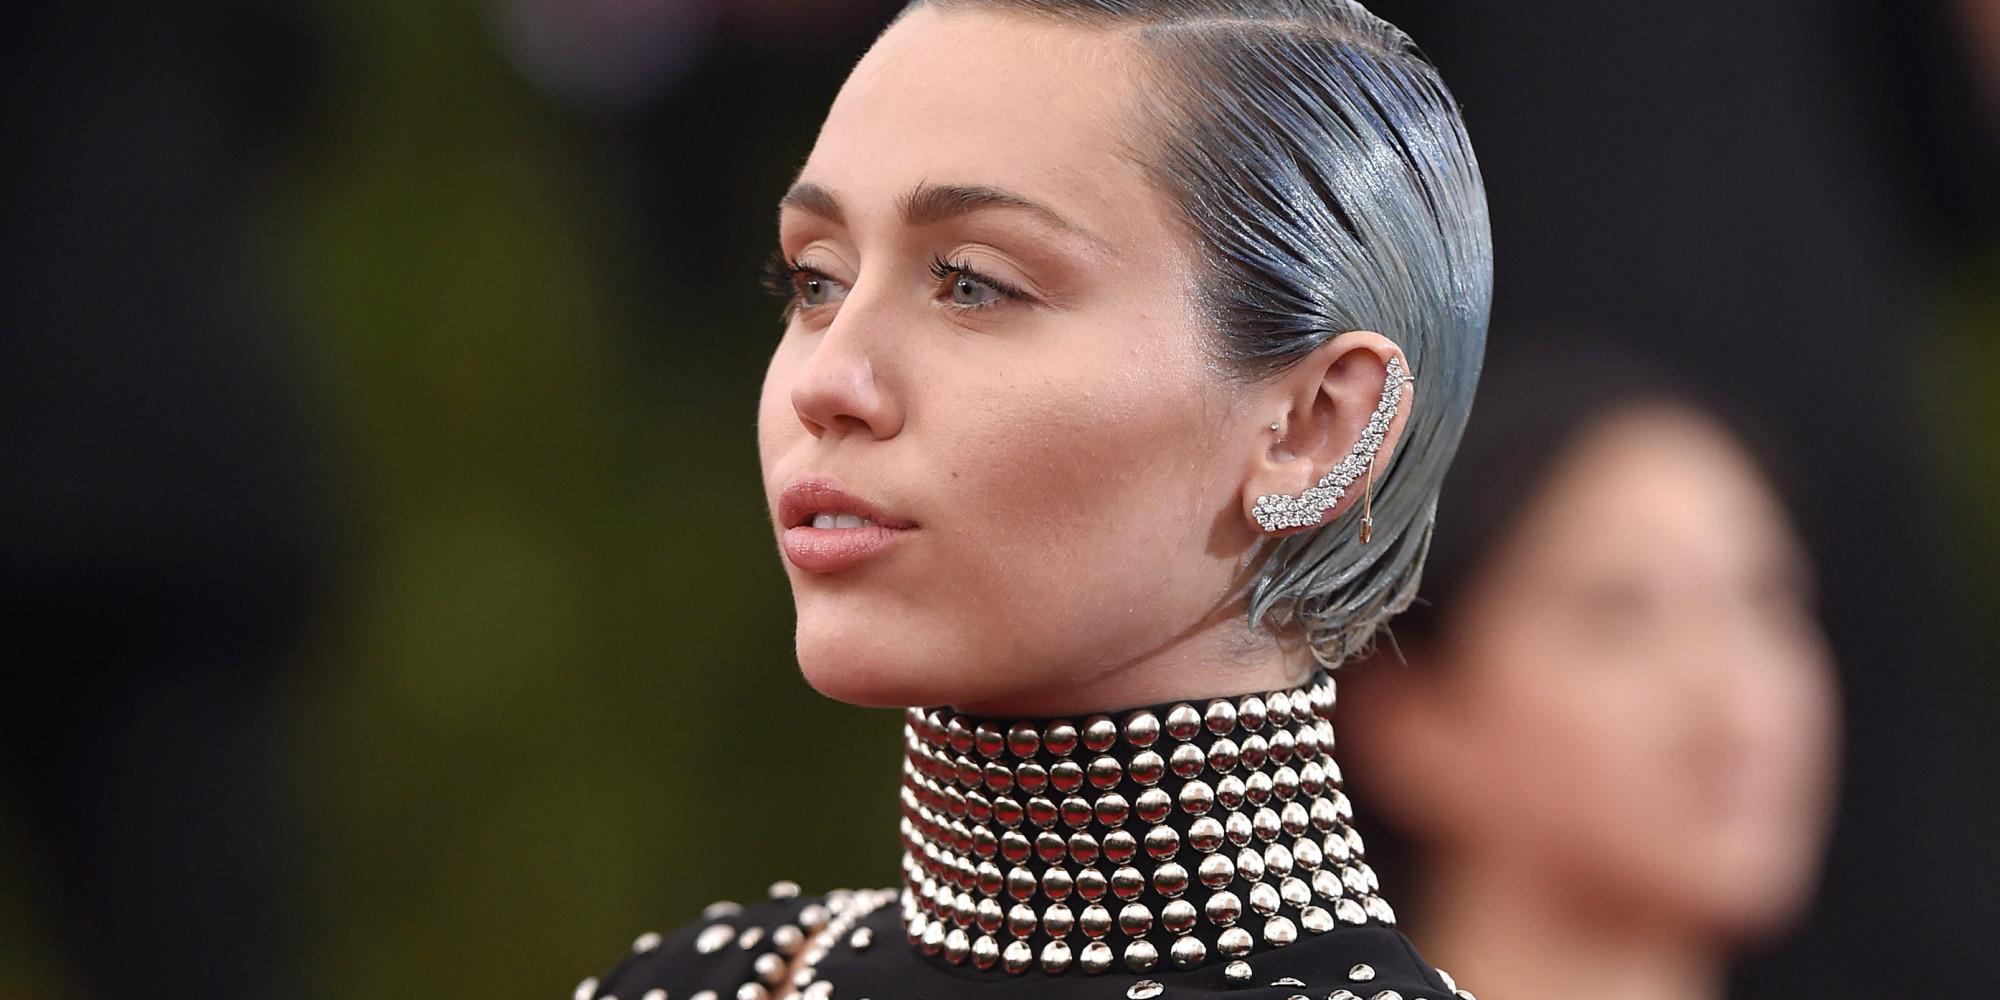 Miley Cyrus: Miley Cyrus Slams Taylor Swift's 'Bad Blood' Video